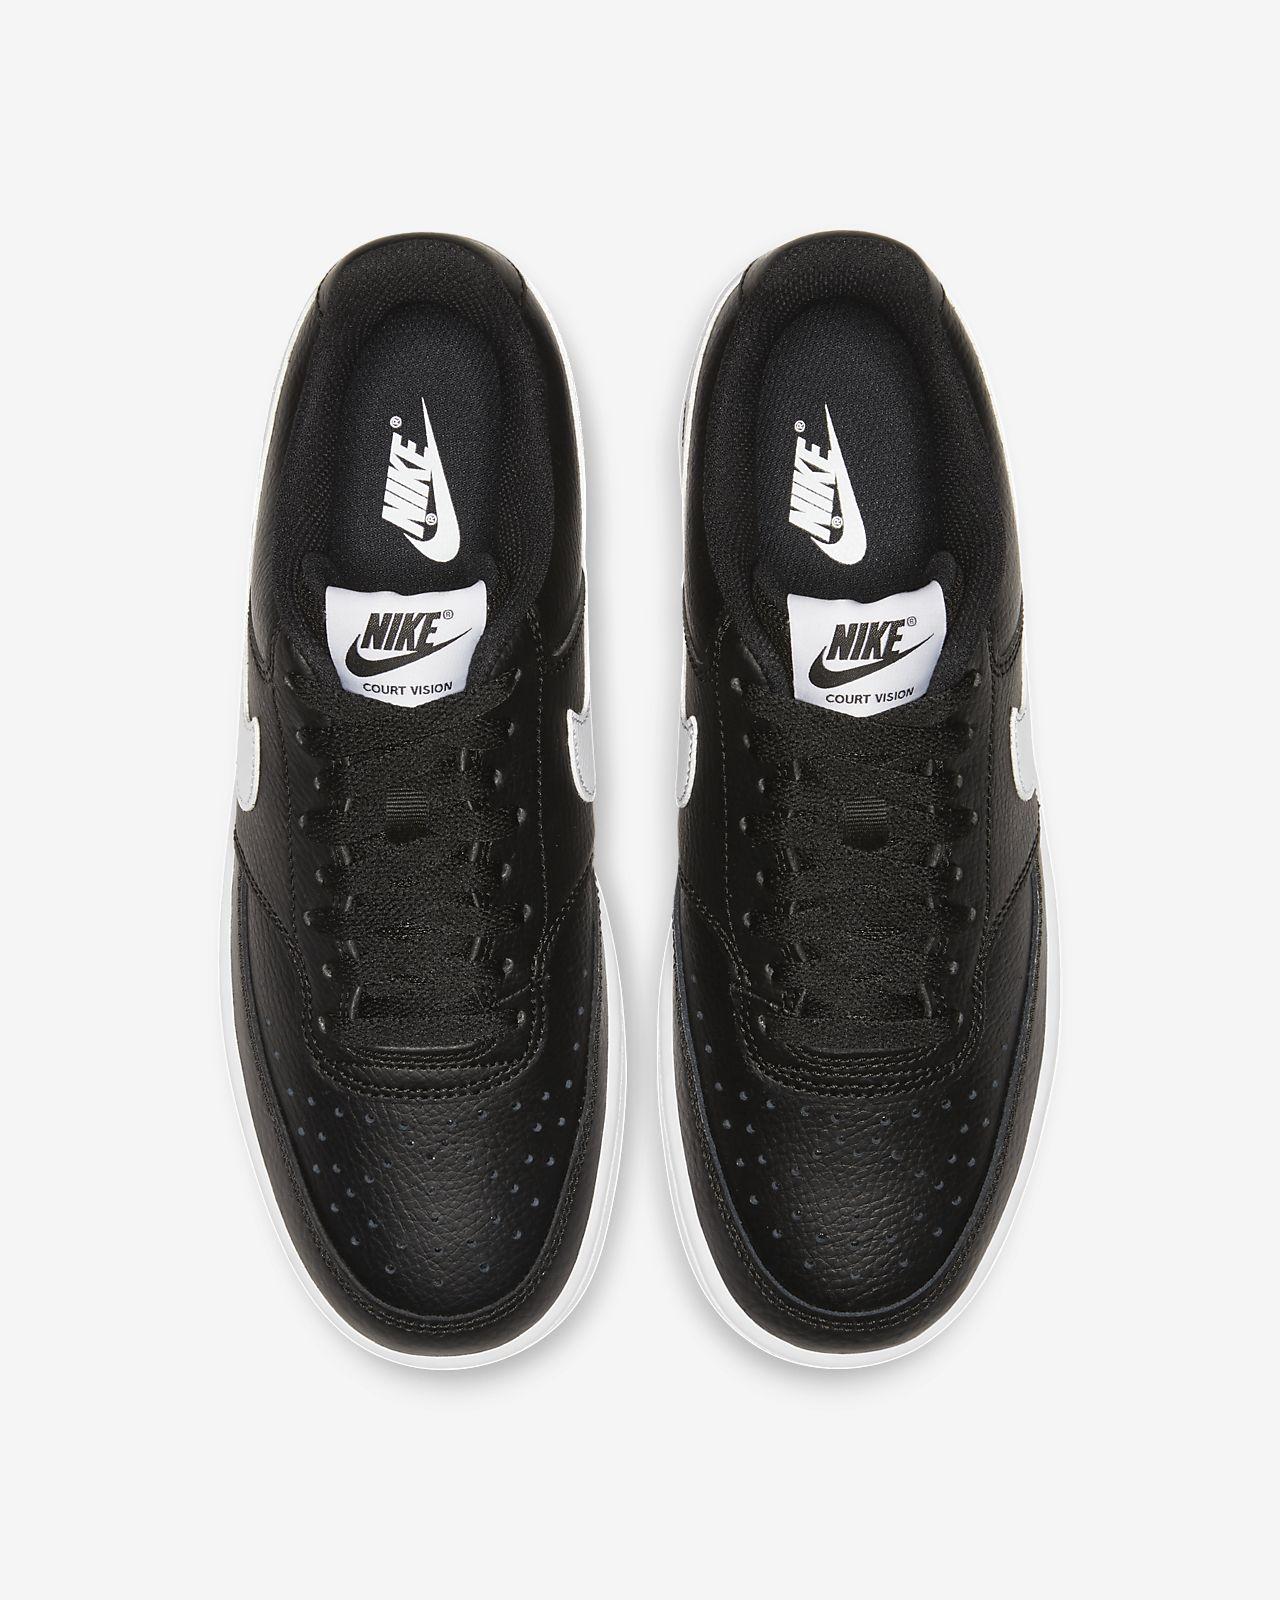 Tênis Nike Court Vision Low Feminino Branco em 2020